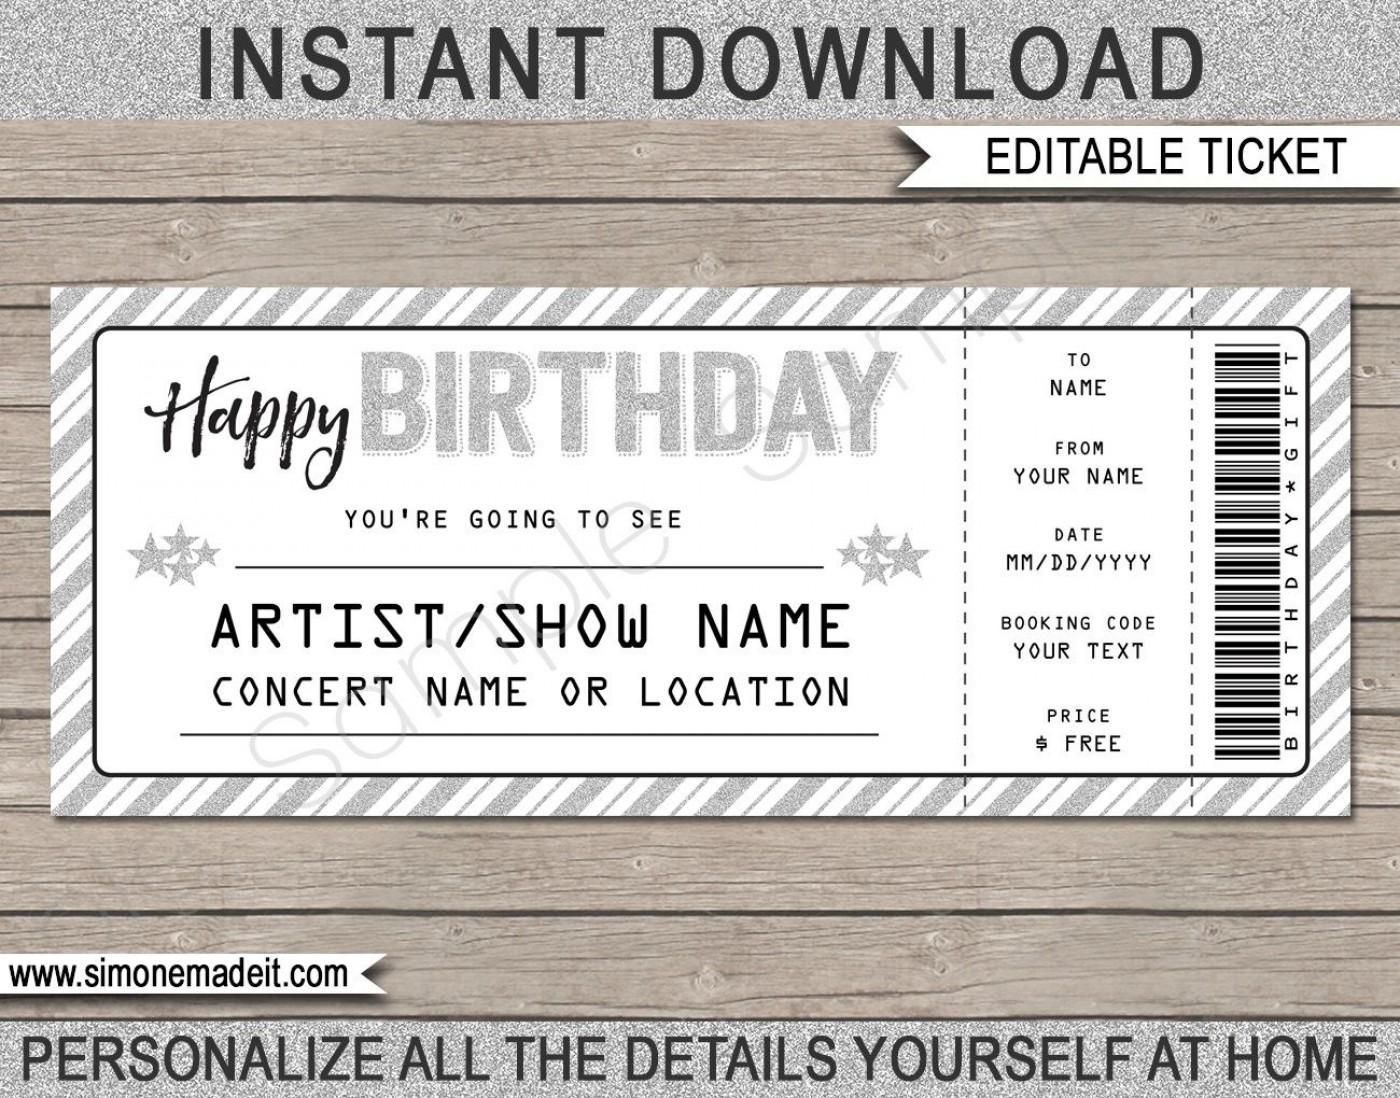 003 Wondrou Editable Ticket Template Free Inspiration  Concert Word Irctc Format Download Movie1400